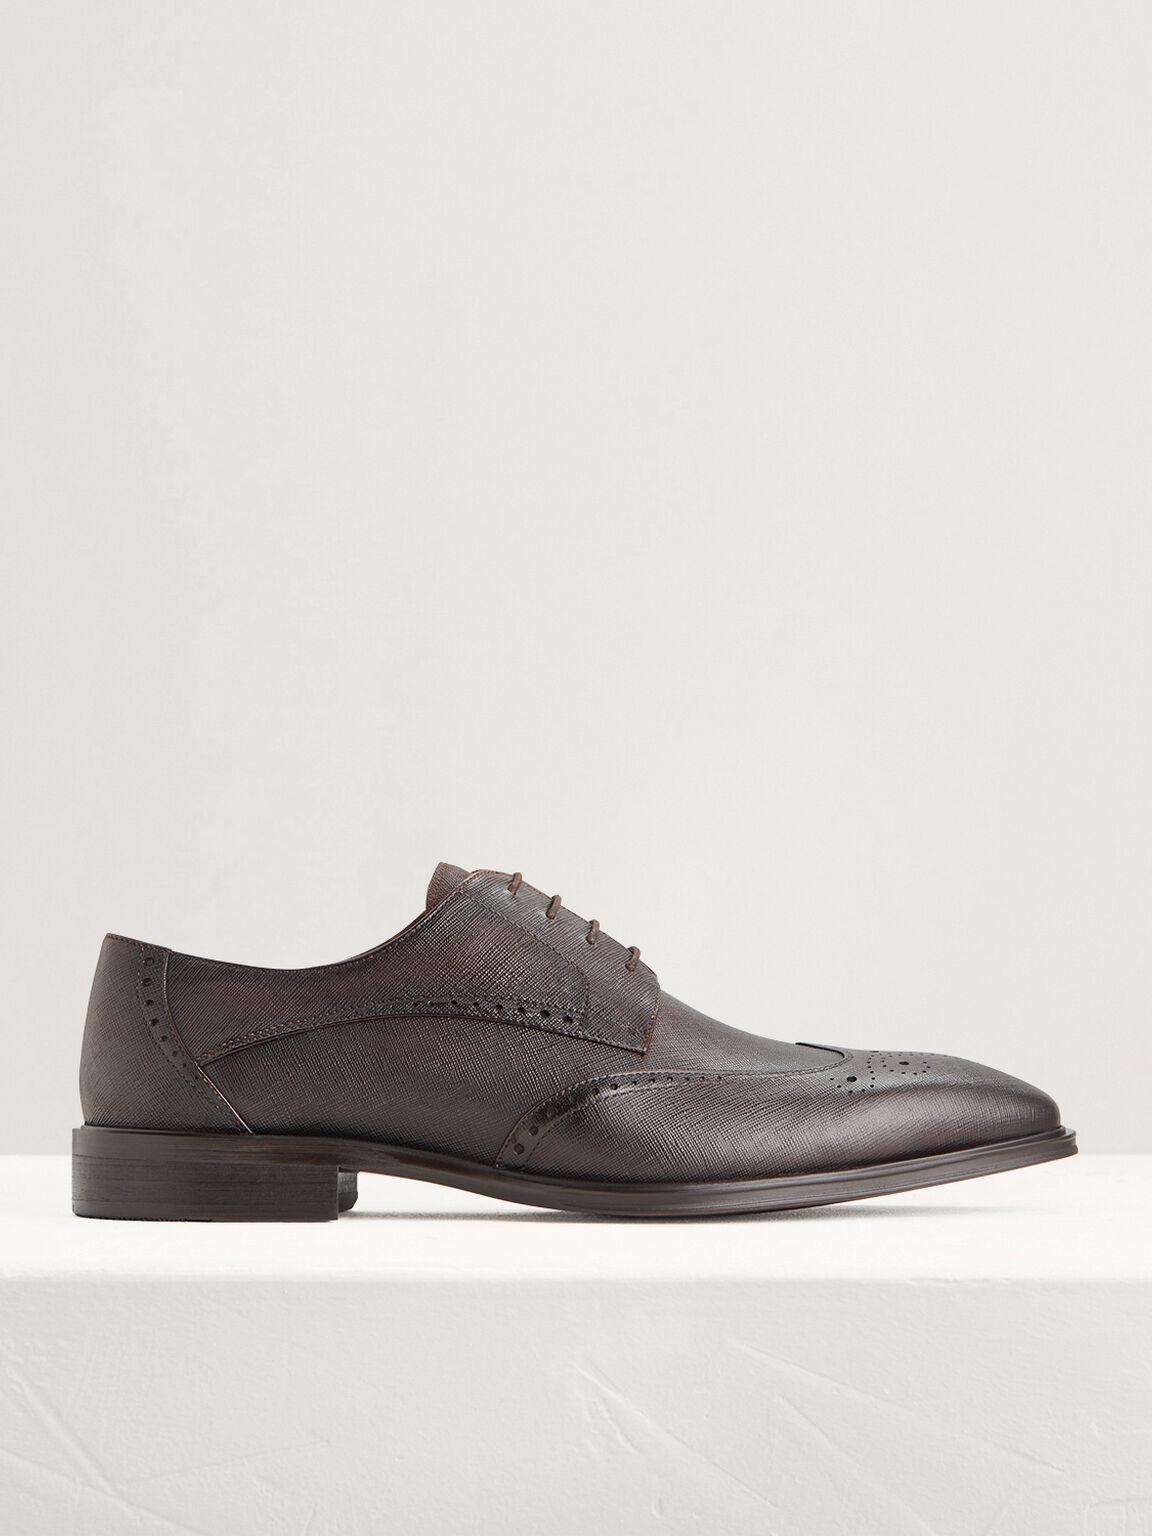 Brogue Leather Derby Shoes, Dark Brown, hi-res